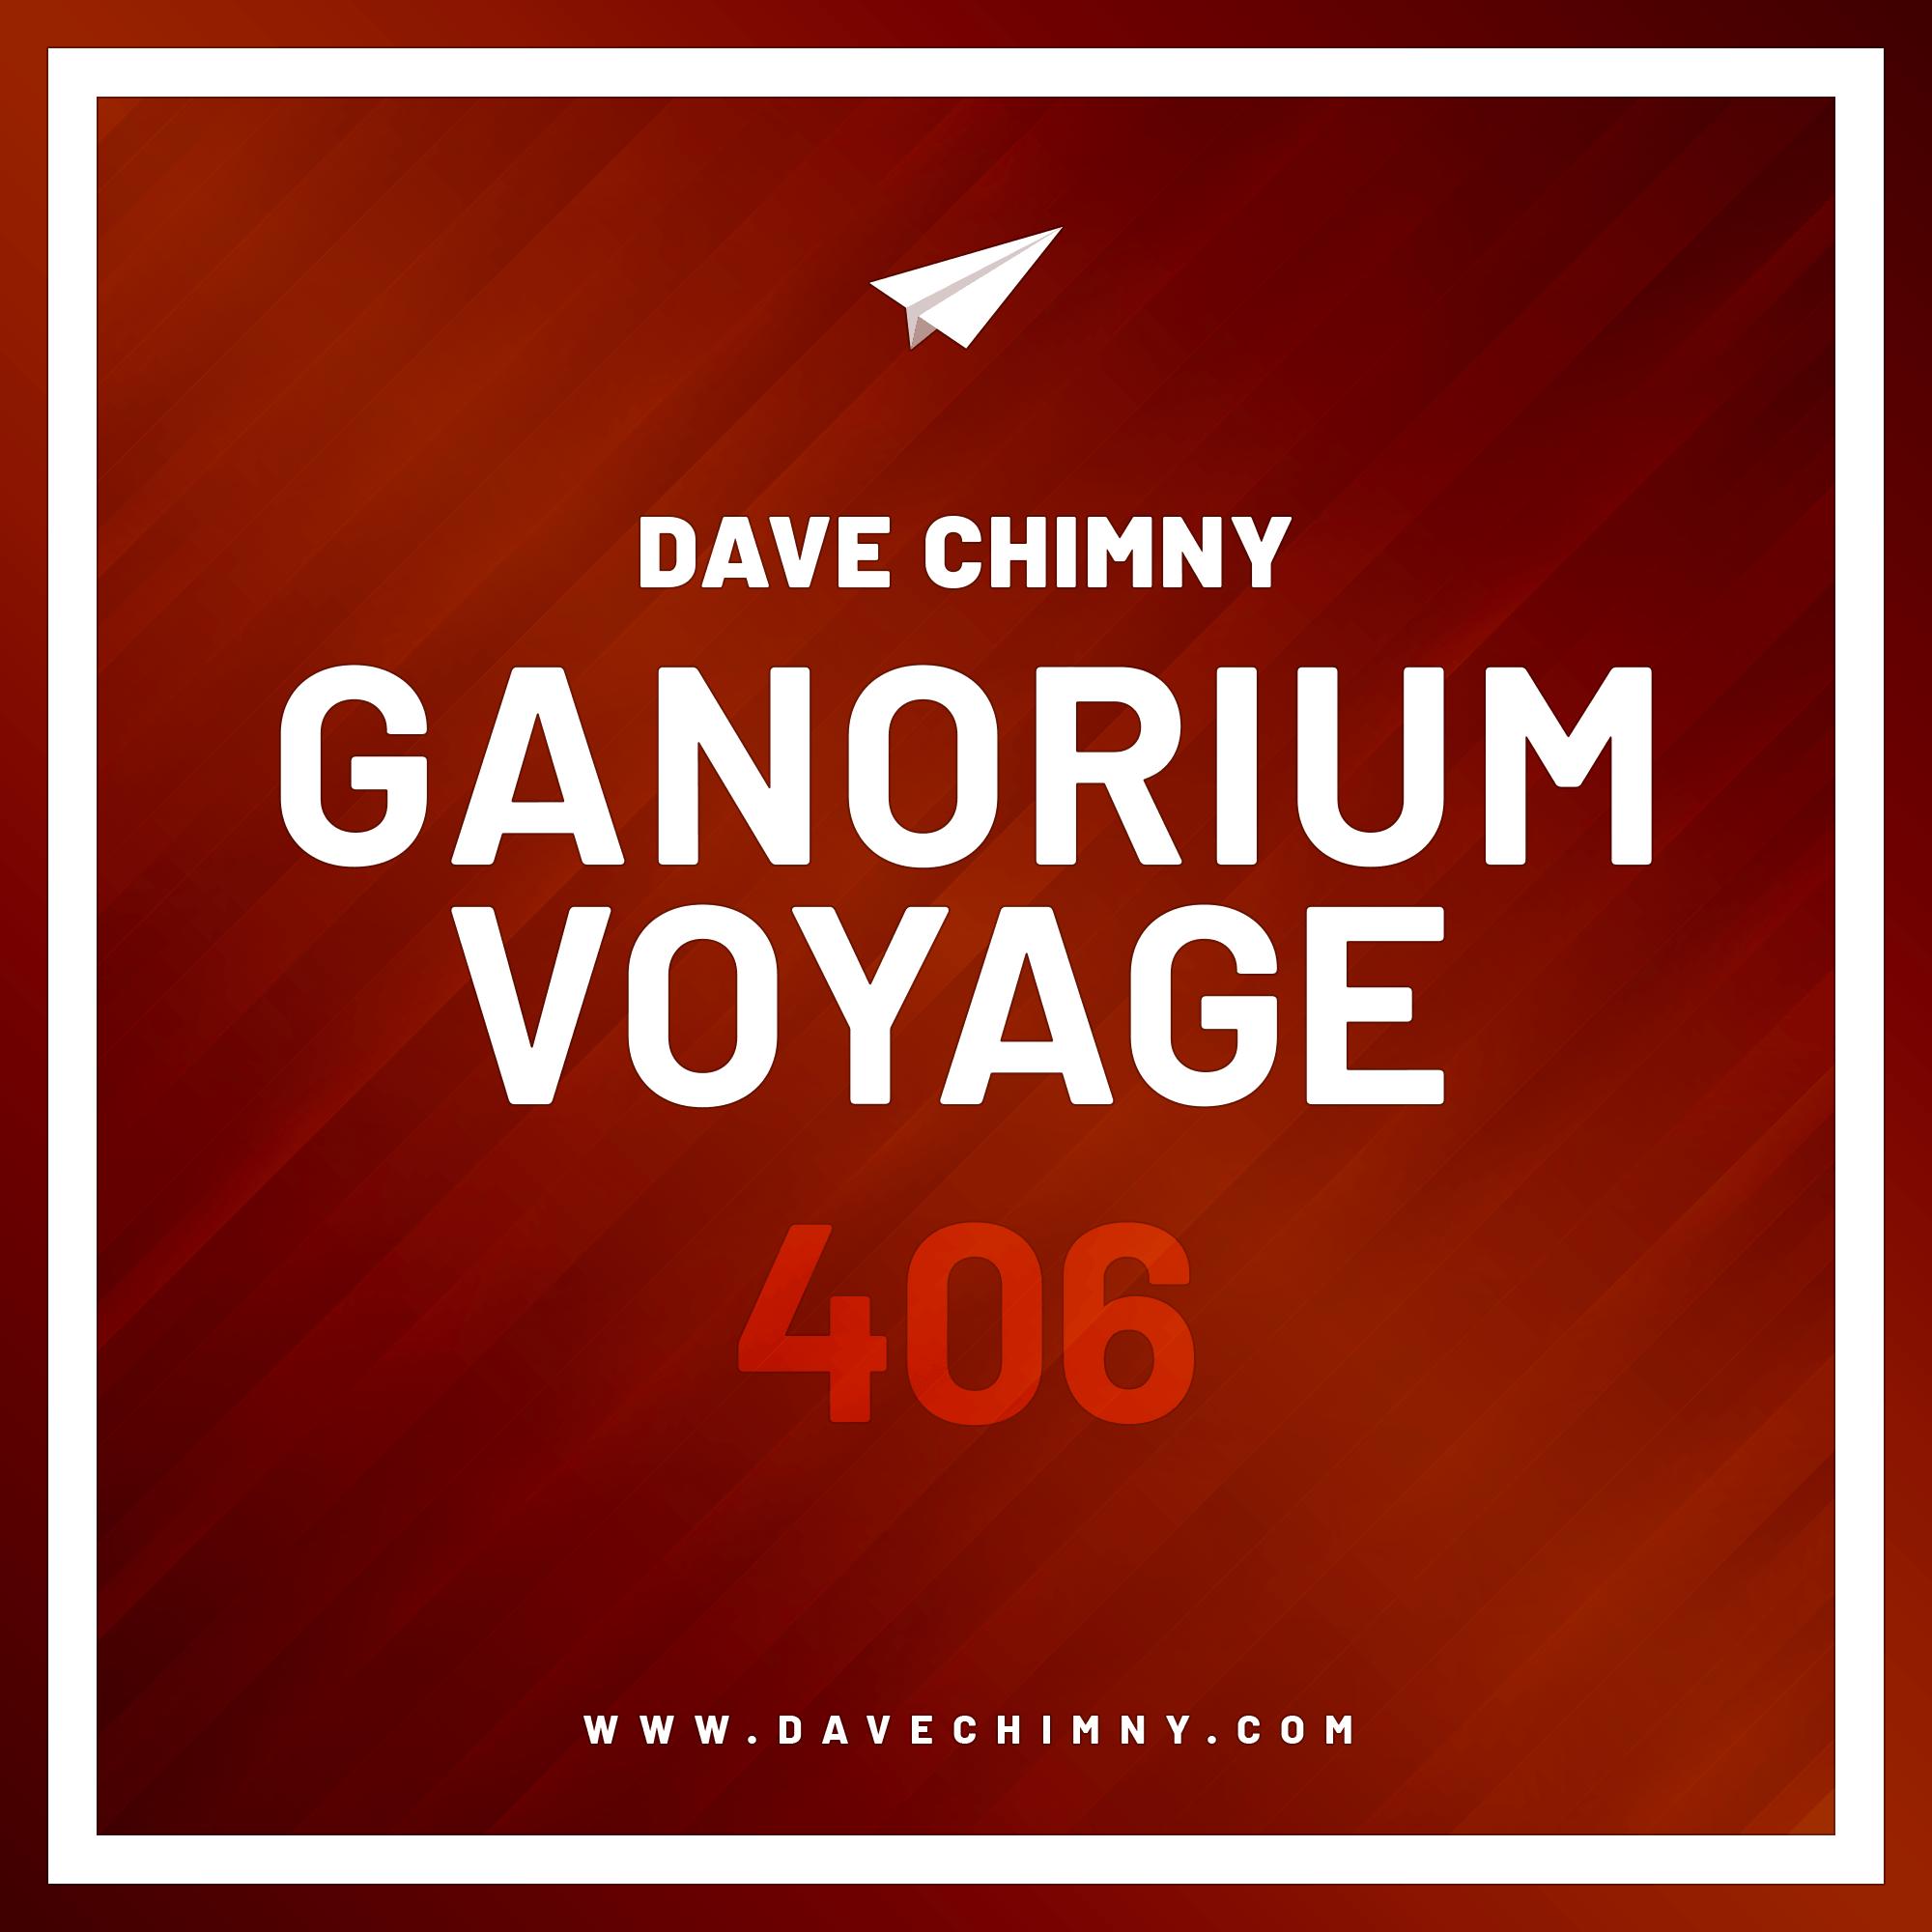 Dave Chimny – Ganorium Voyage 406